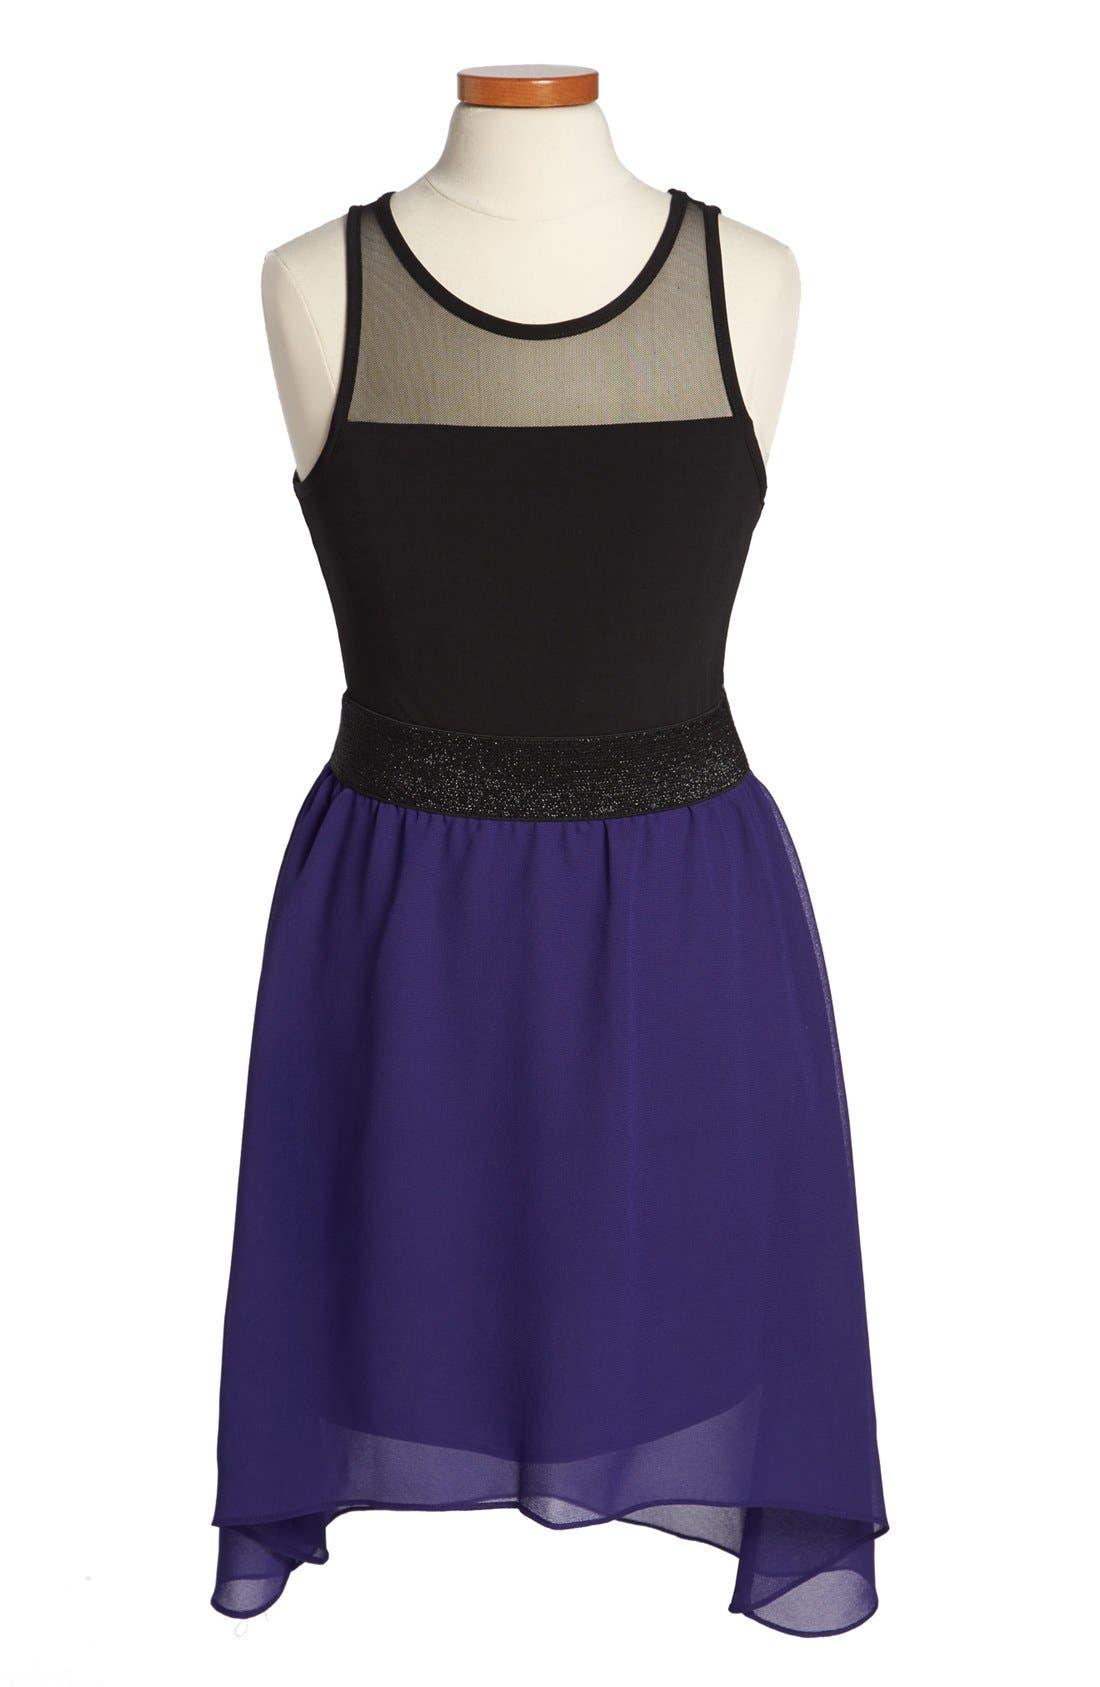 Main Image - Sally Miller 'Carly' Dress (Big Girls)